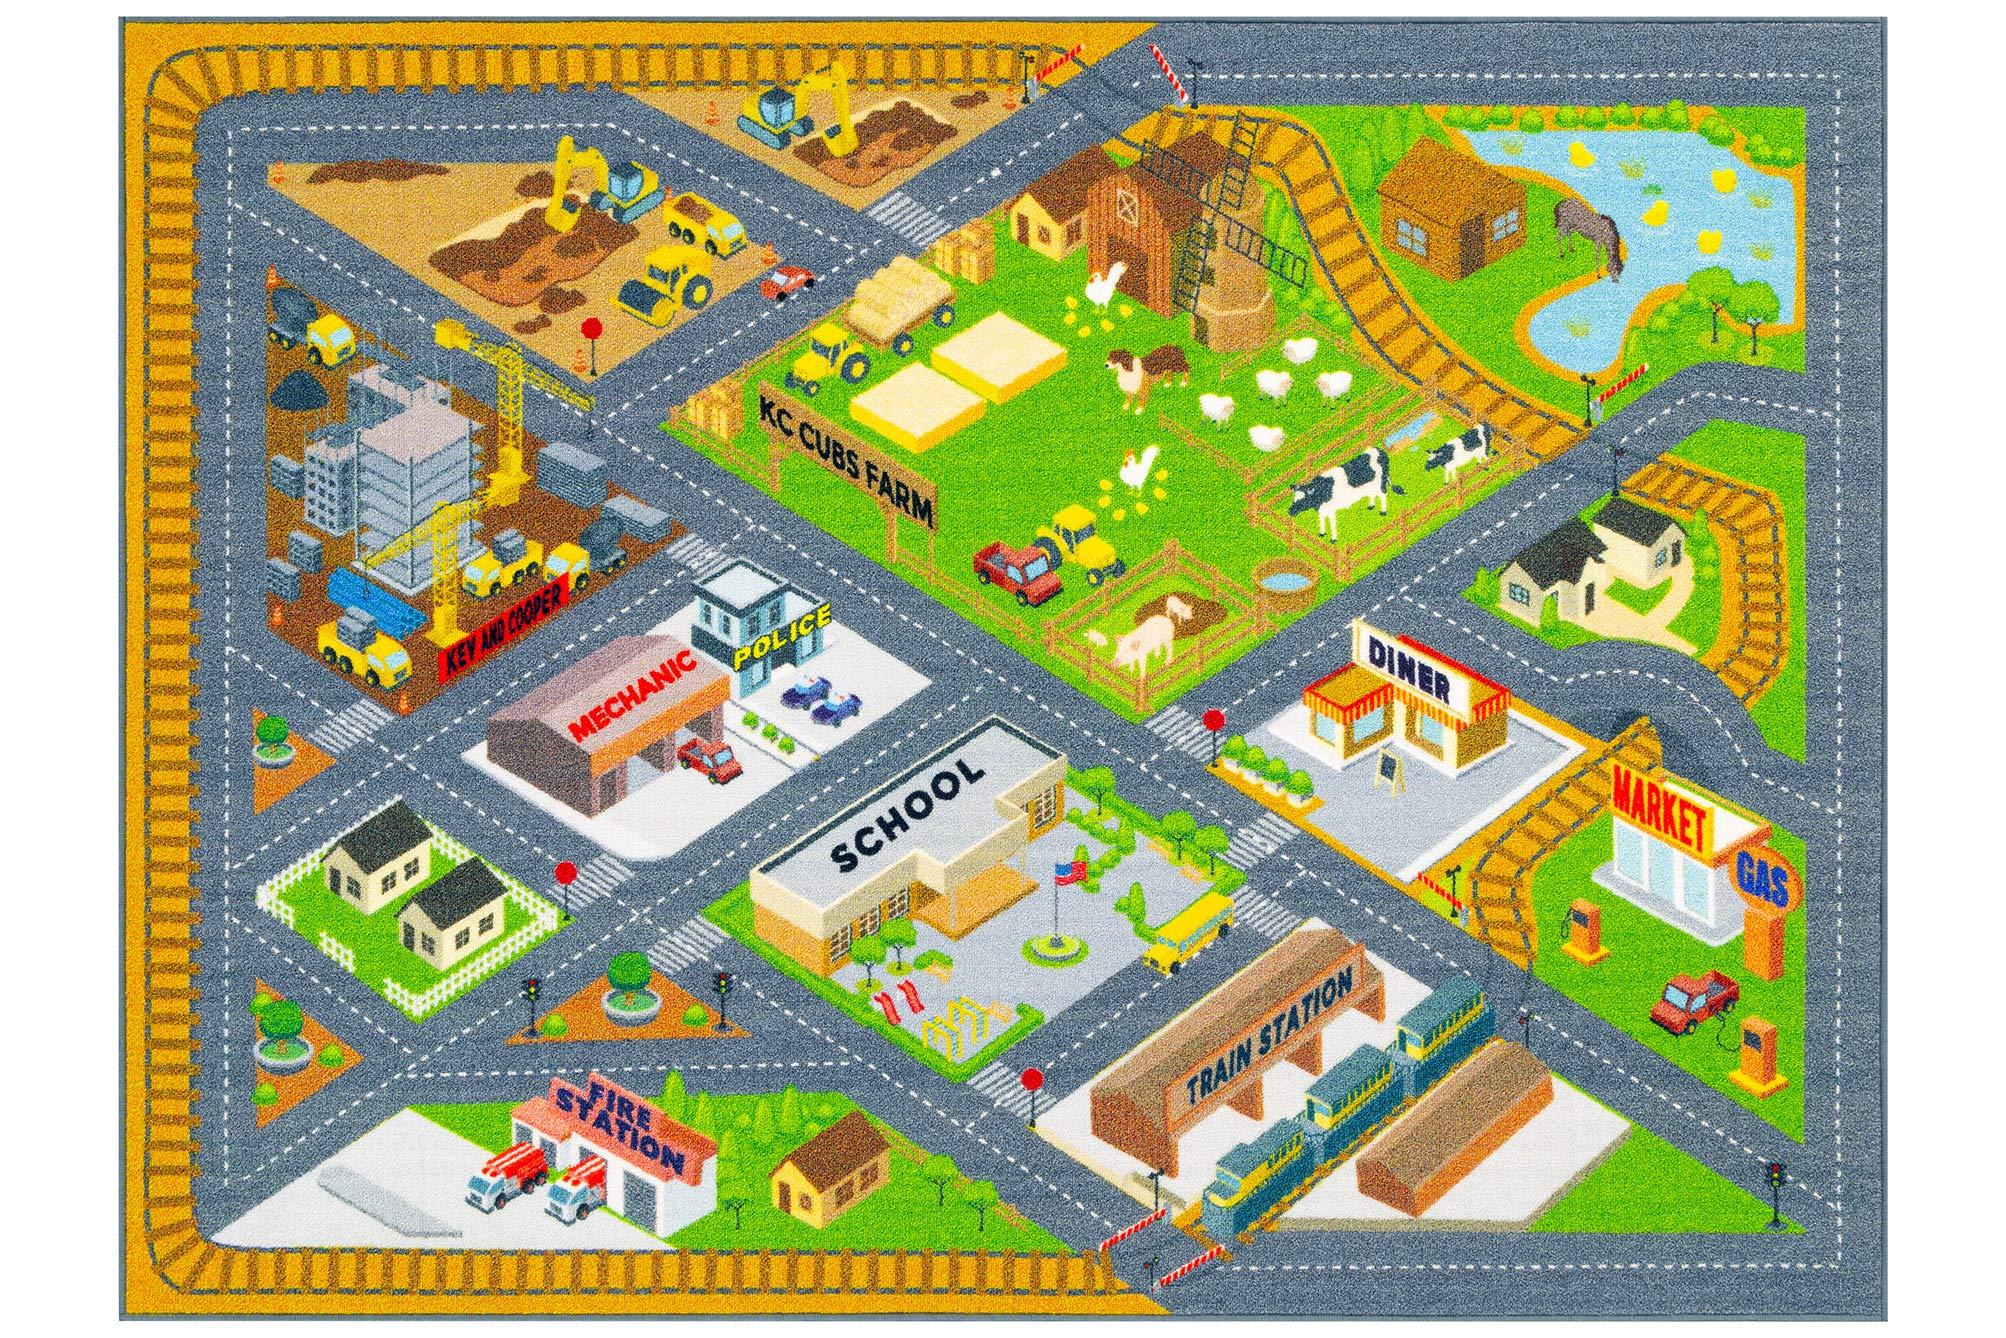 Farm Road Map Area Rug Carpet Kids Play Fun Toddler 5 0x6 6 Educational New 784016368735 Ebay